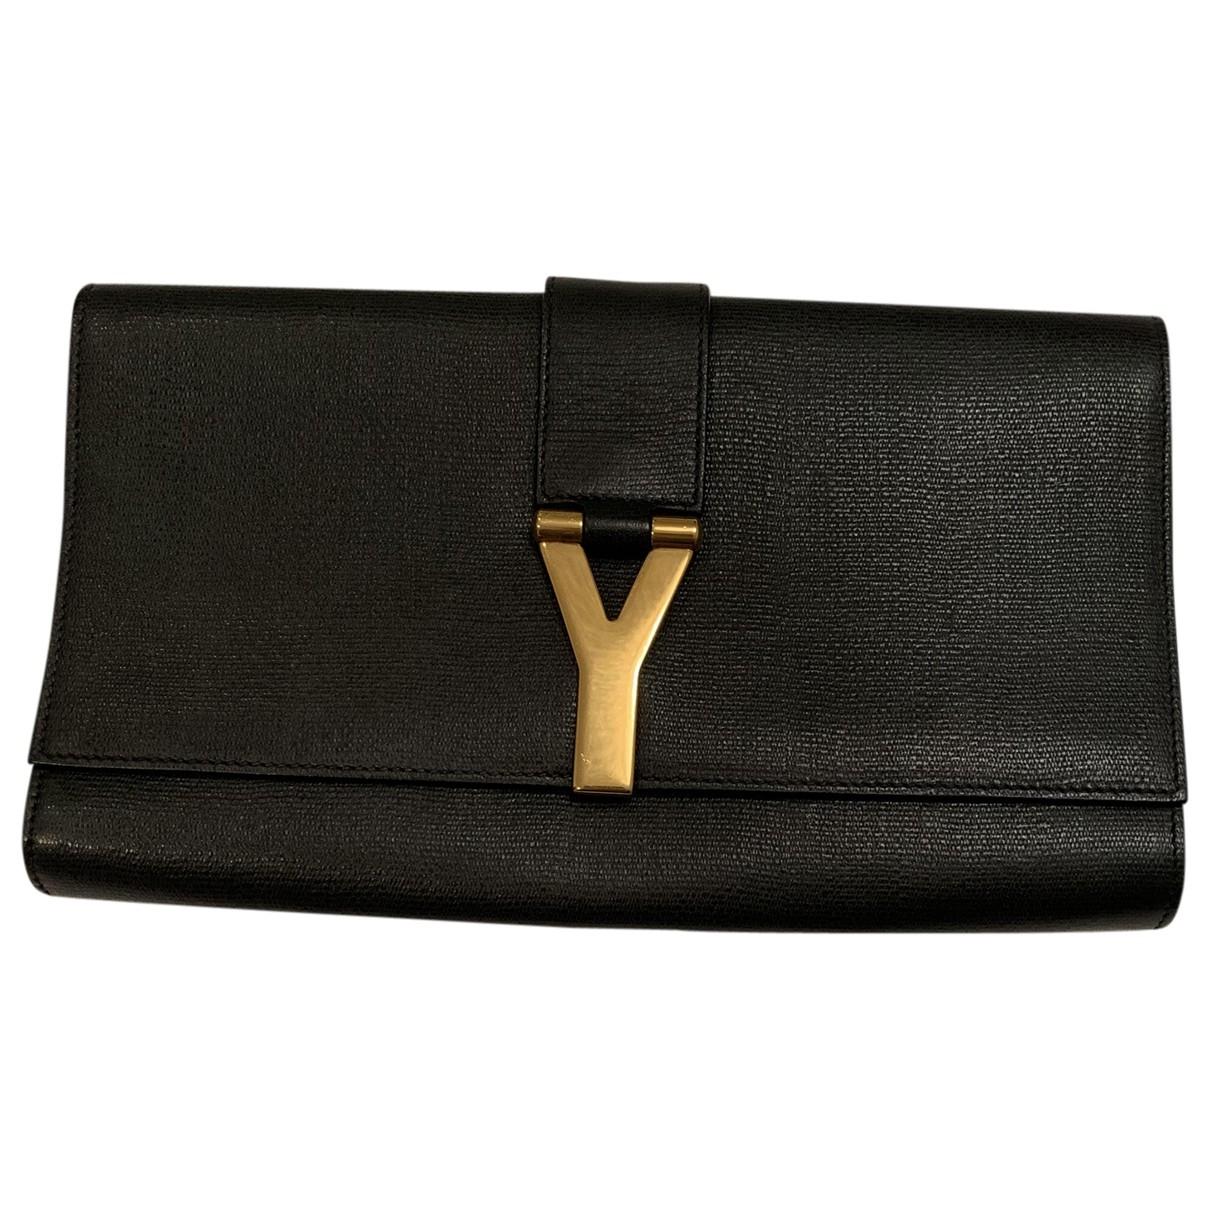 Yves Saint Laurent Chyc Clutch in  Schwarz Leder